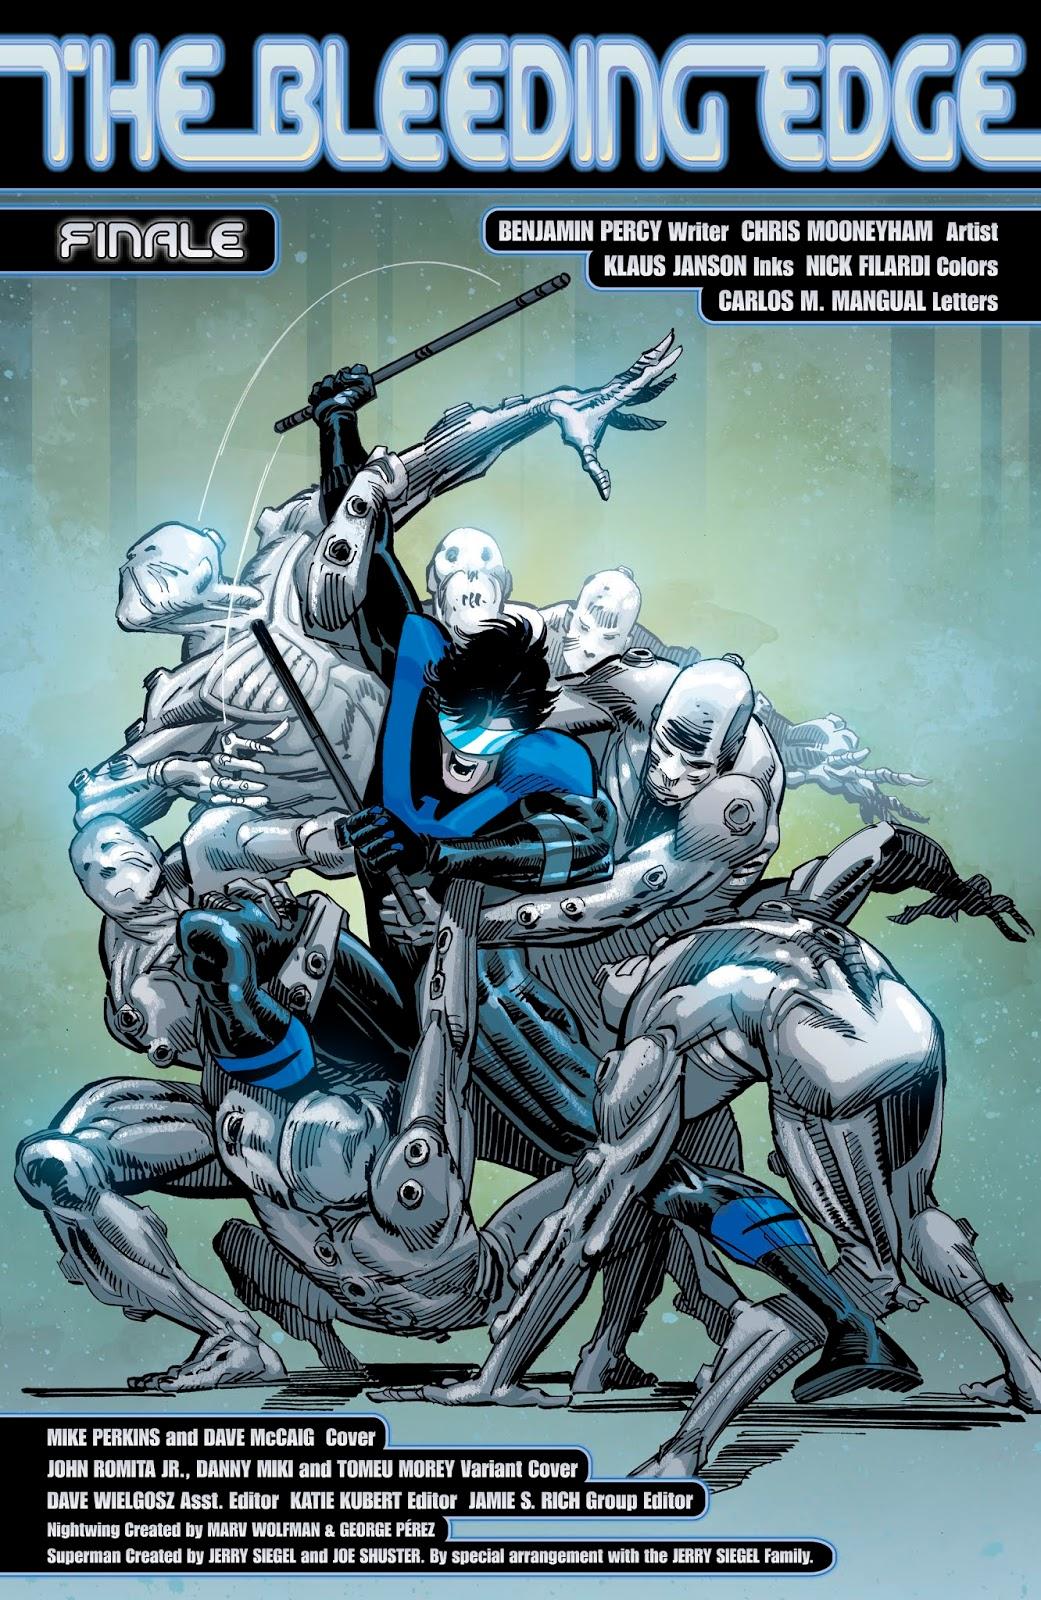 Nightwing Vol. 4 #47